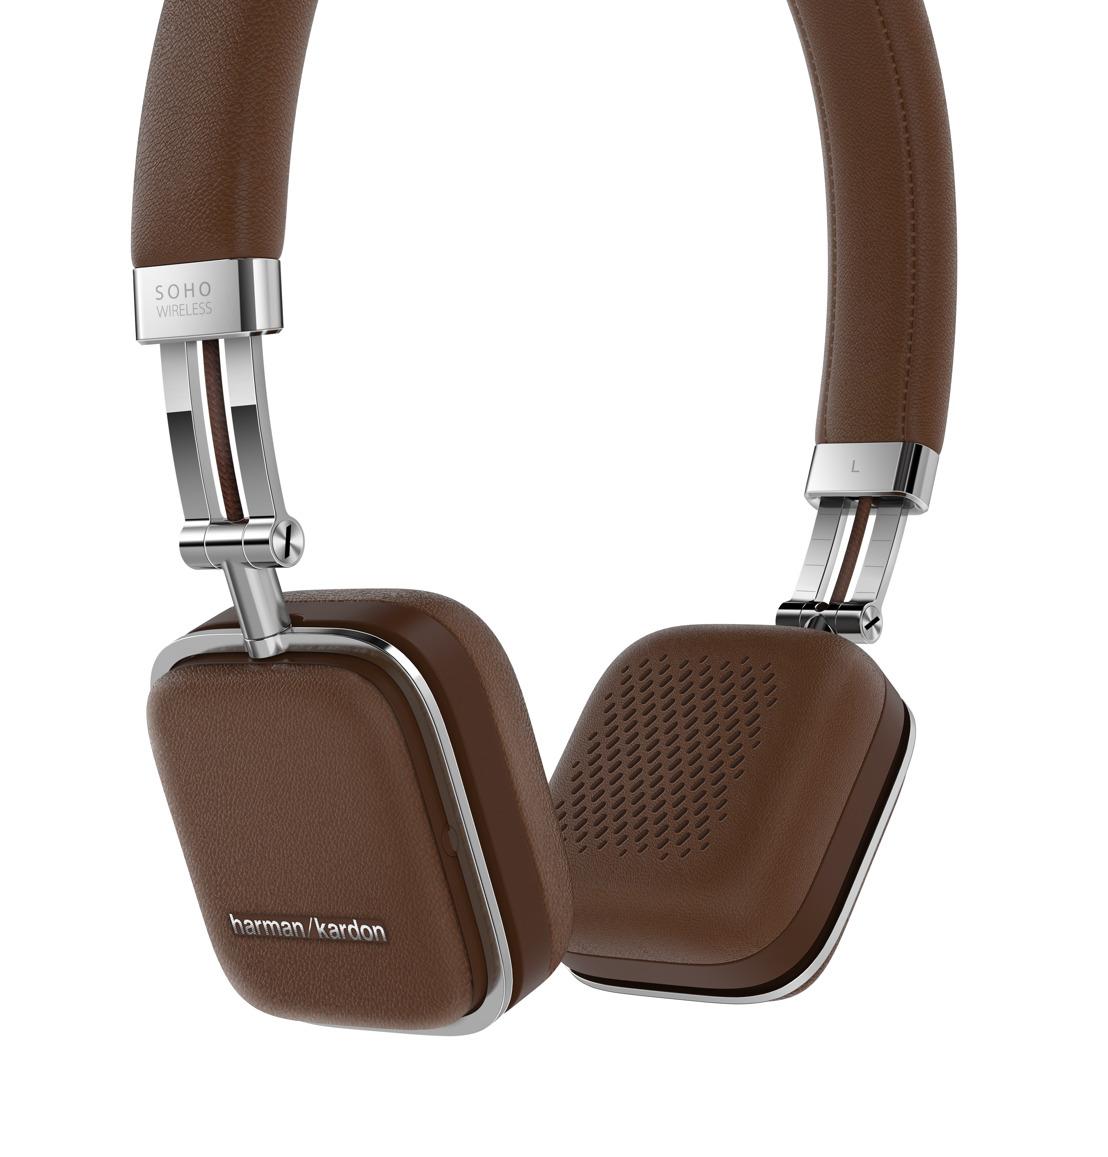 IFA 2014: HARMAN lancerer de trådløse høretelefoner Harman Kardon Soho Wireless